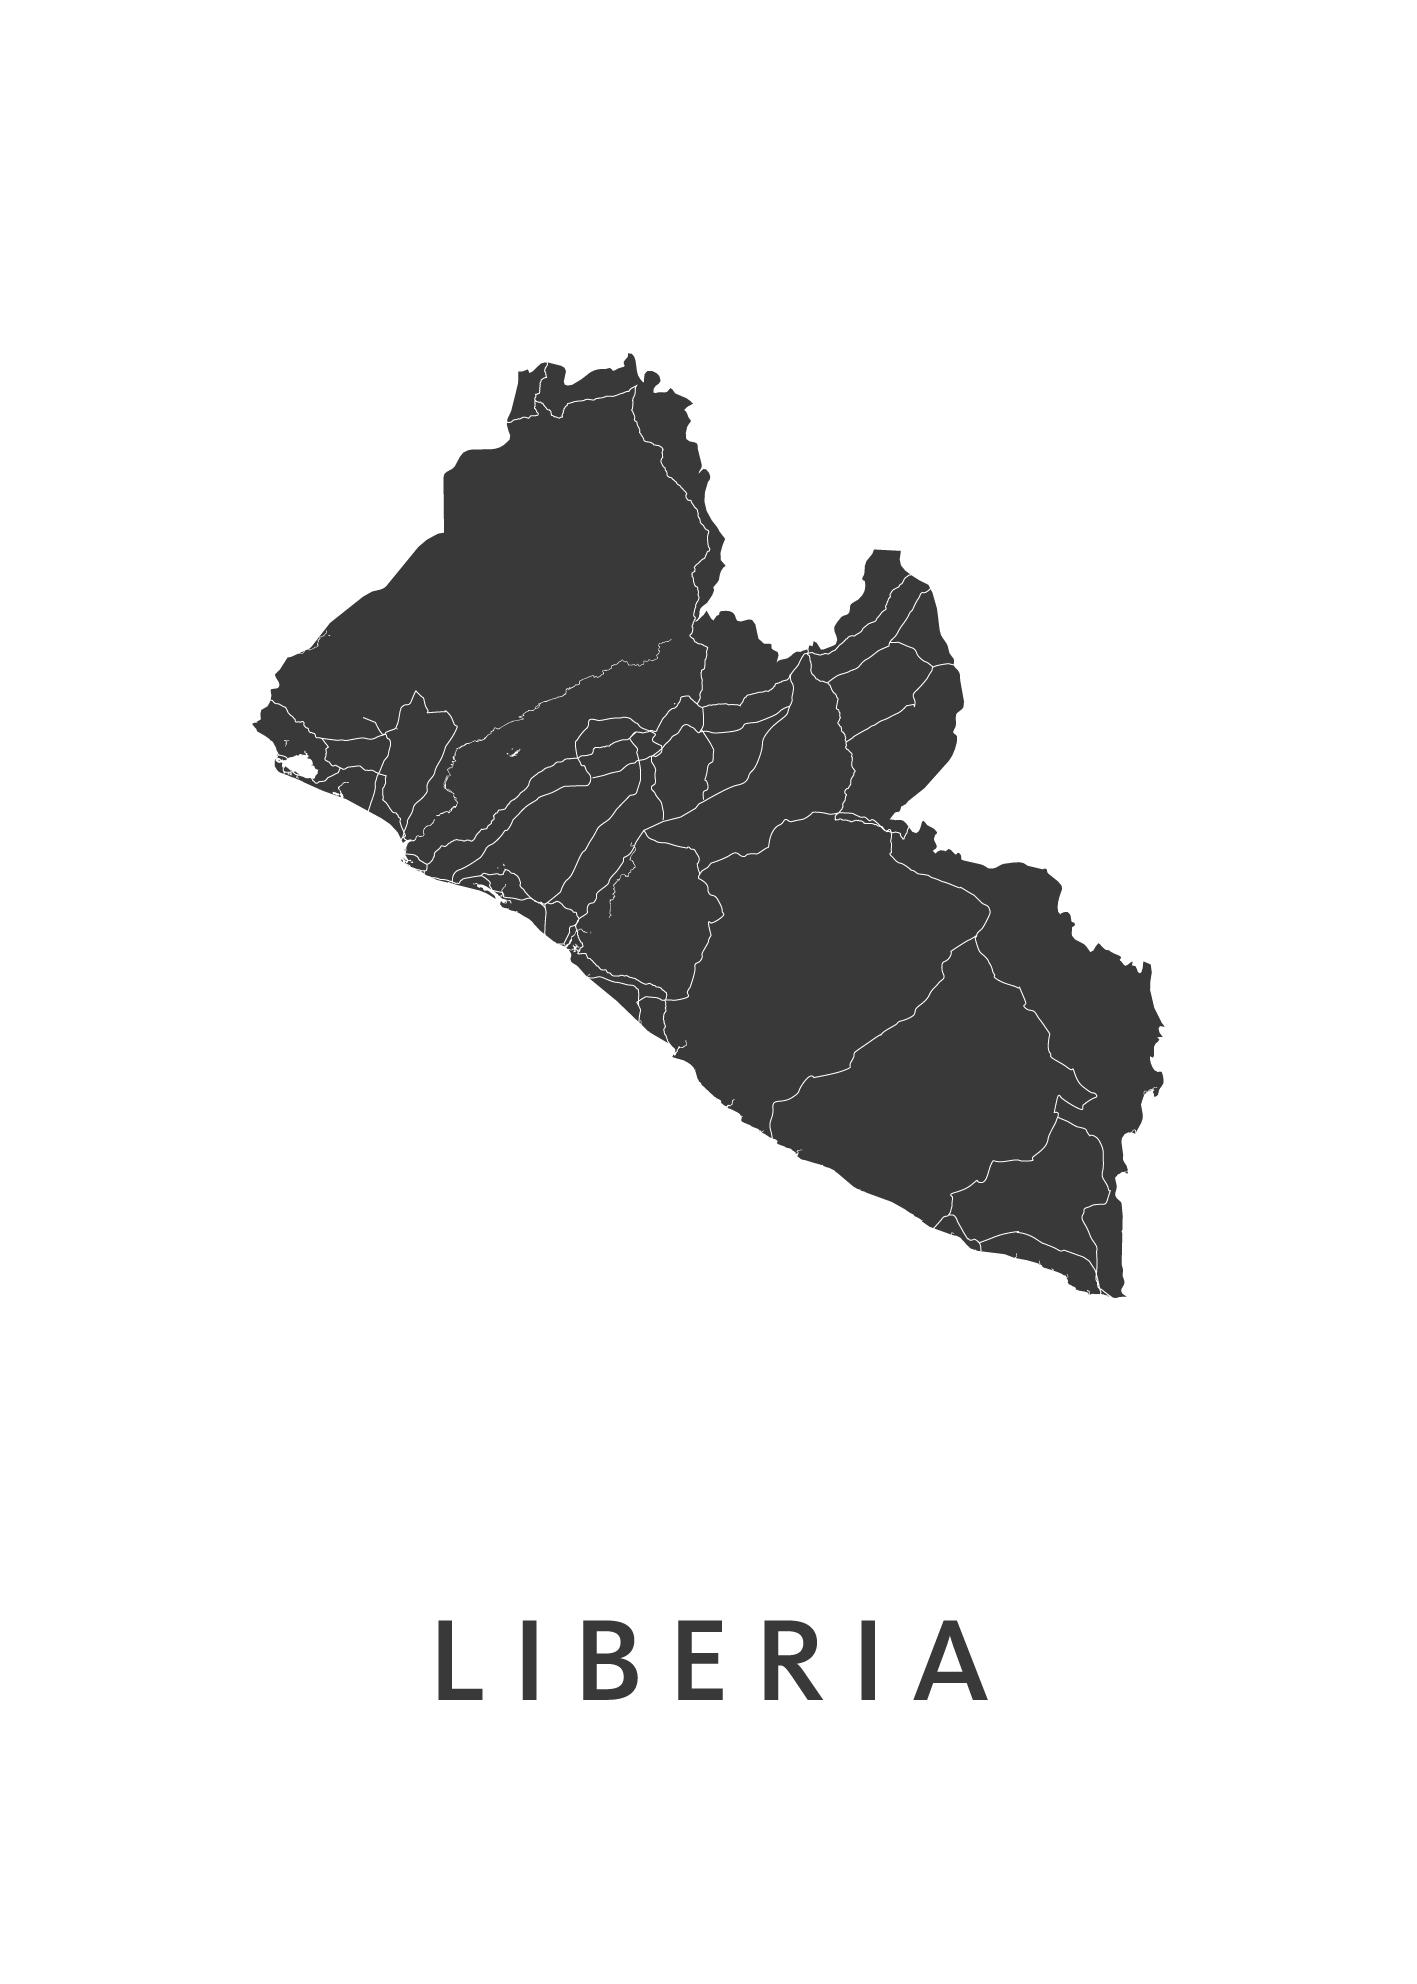 Liberia Landkaart